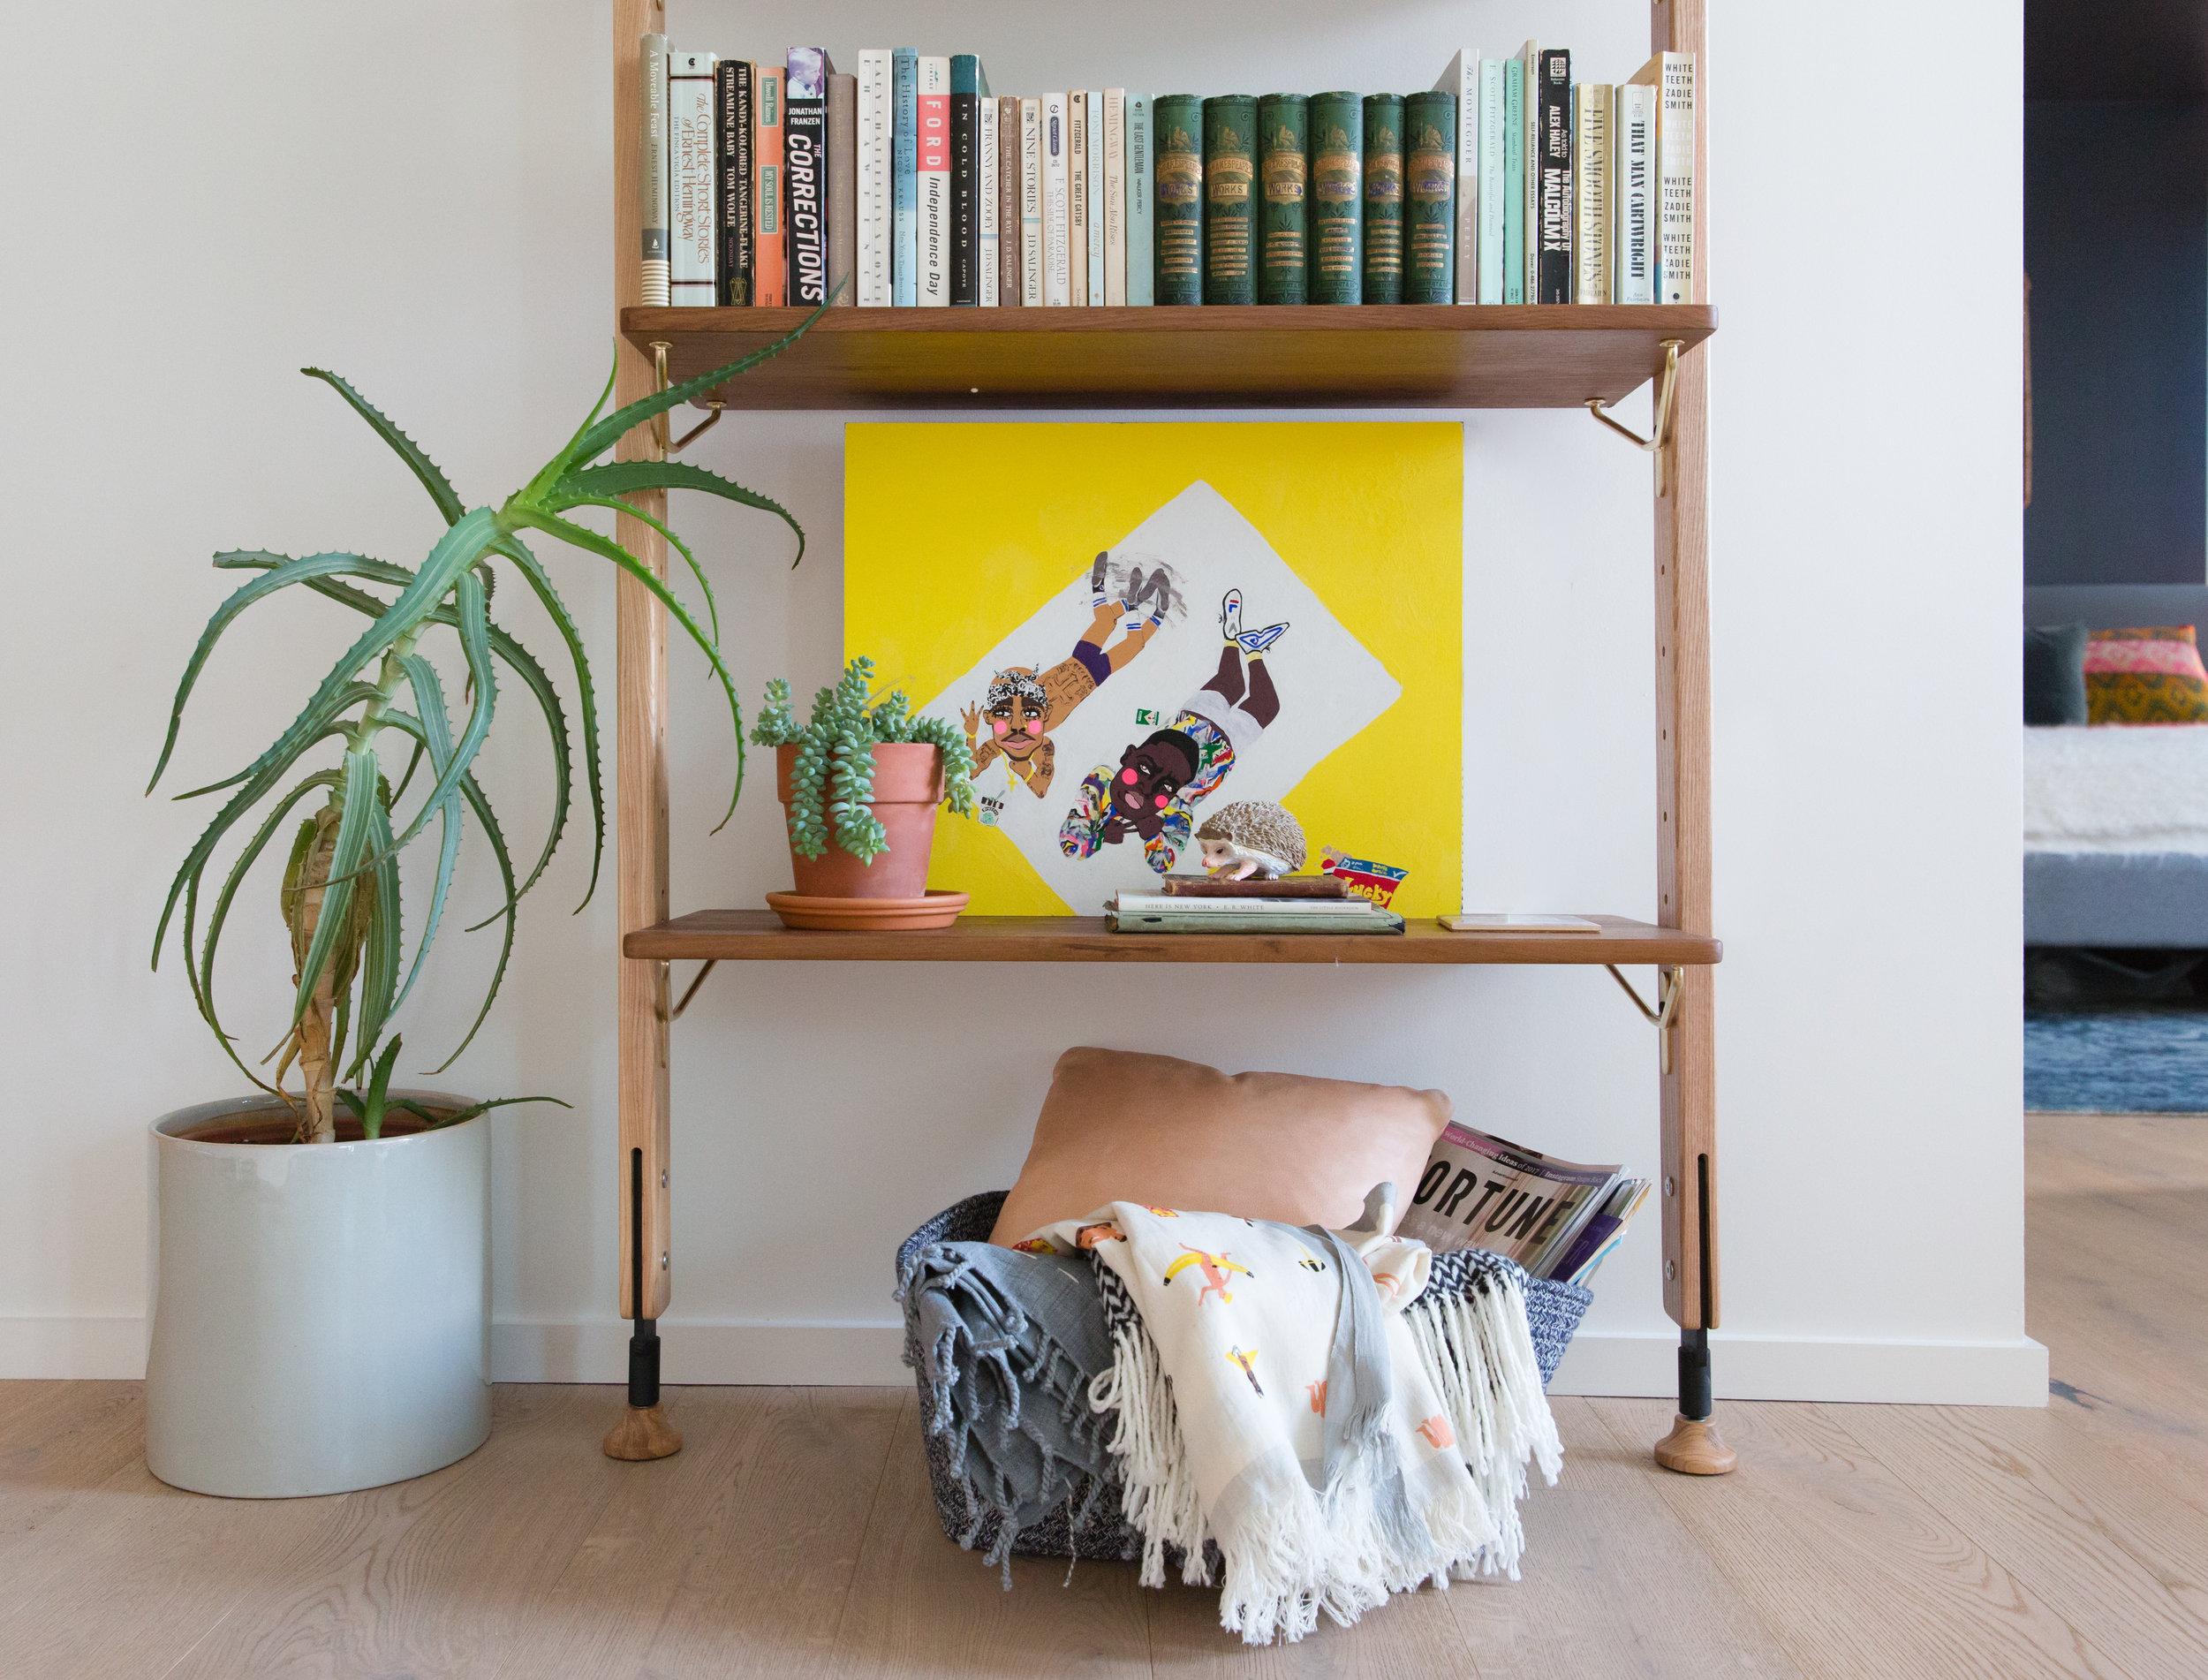 17 RBD Hayes Valley Hip Haven - Living Room Bookshelf Vignette.jpg